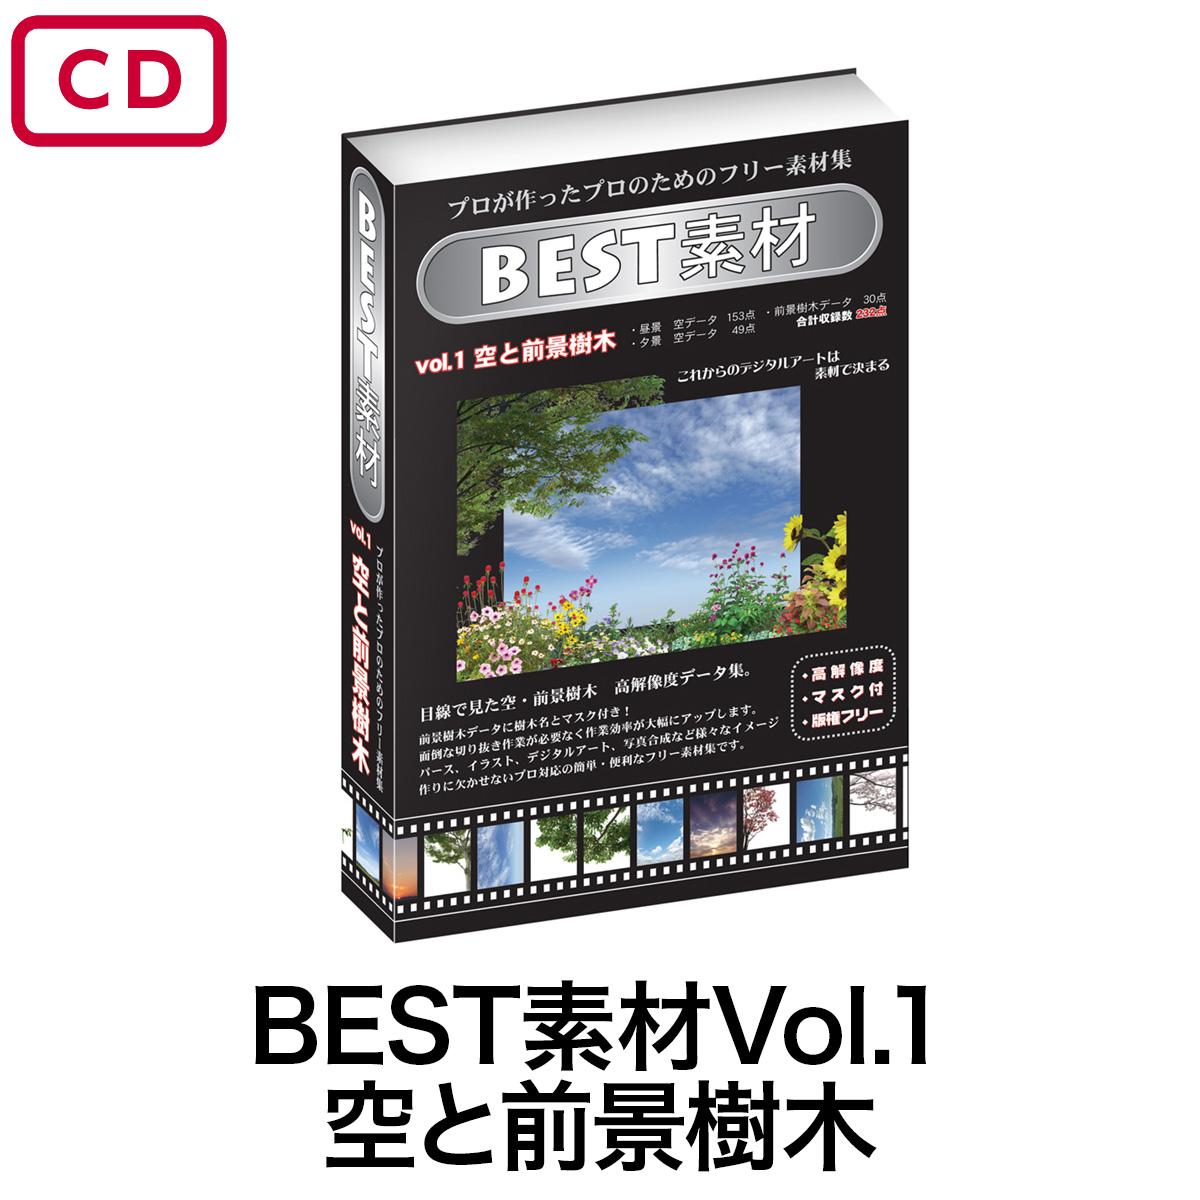 【BEST素材vol.1 空と前景樹木】空は目線で見た空の昼景や夕景、前景樹木はマスク付で簡単に合成できます。前景と背景を入れ替えるだけでイメージの幅が広がります。